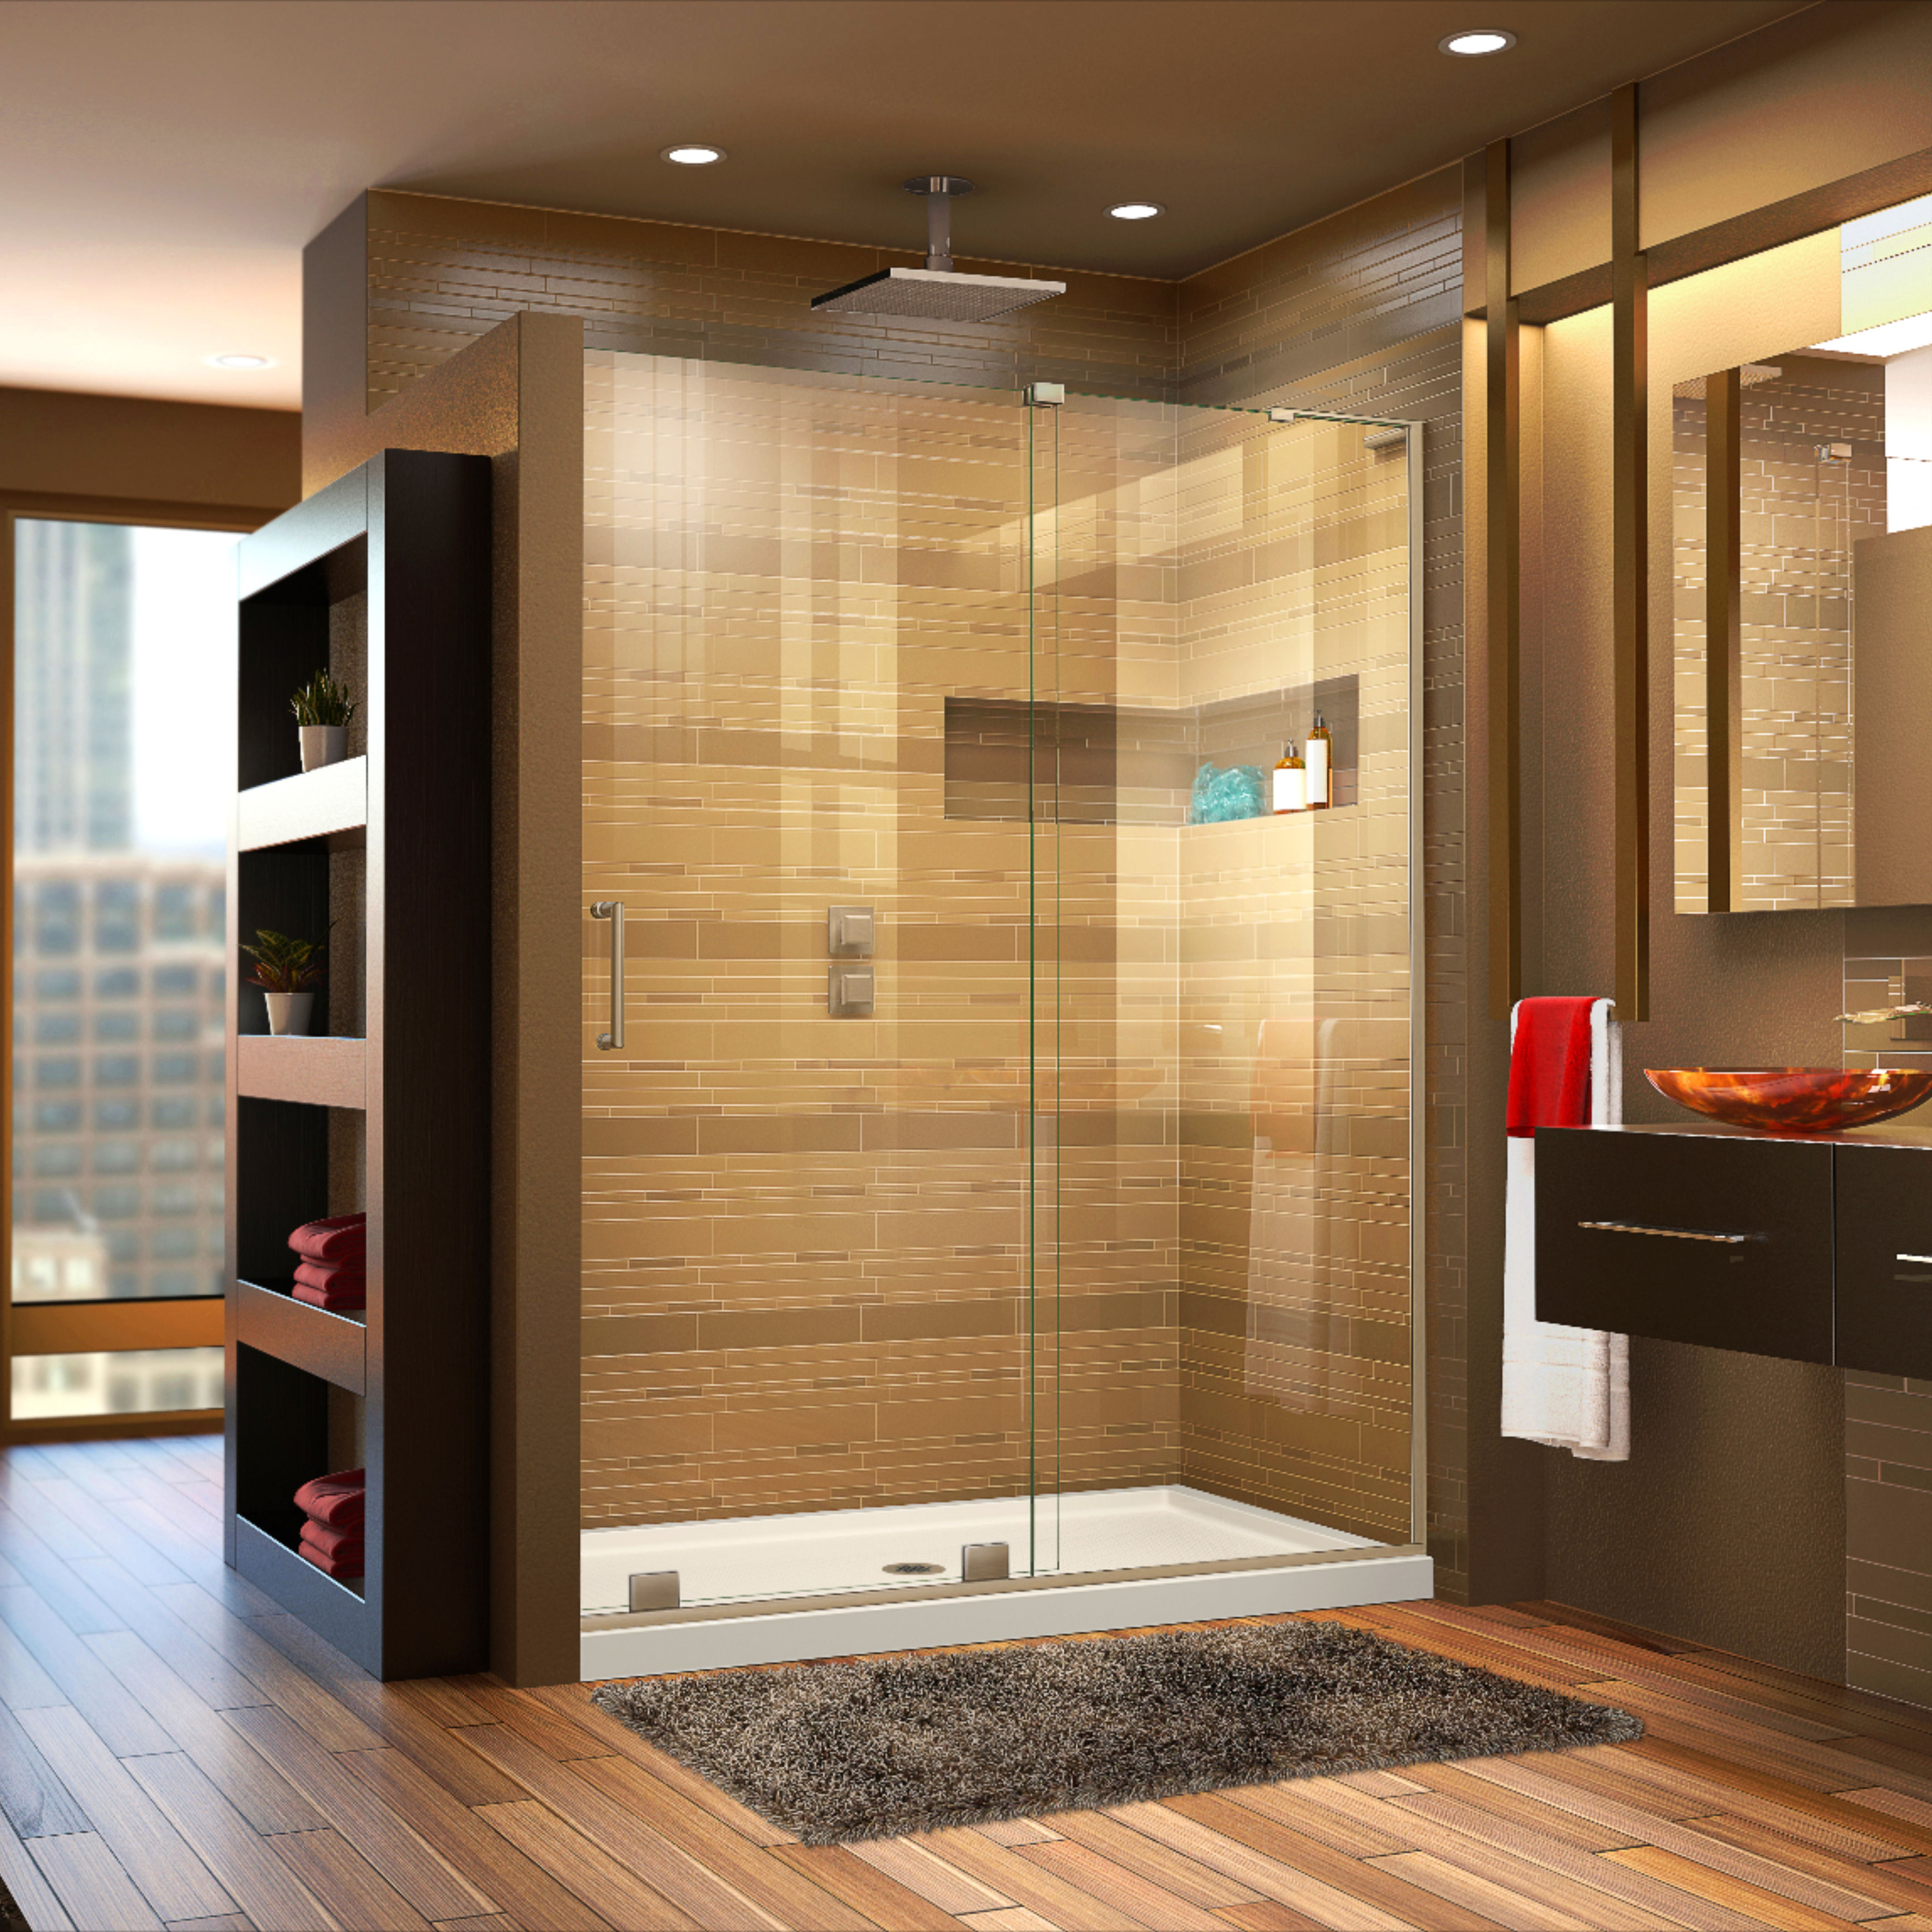 Dreamline Mirage X 56 60 In W X 72 In H Frameless Sliding Shower Door Frameless Shower Doors Shower Doors Frameless Sliding Shower Doors 60 x 72 shower door